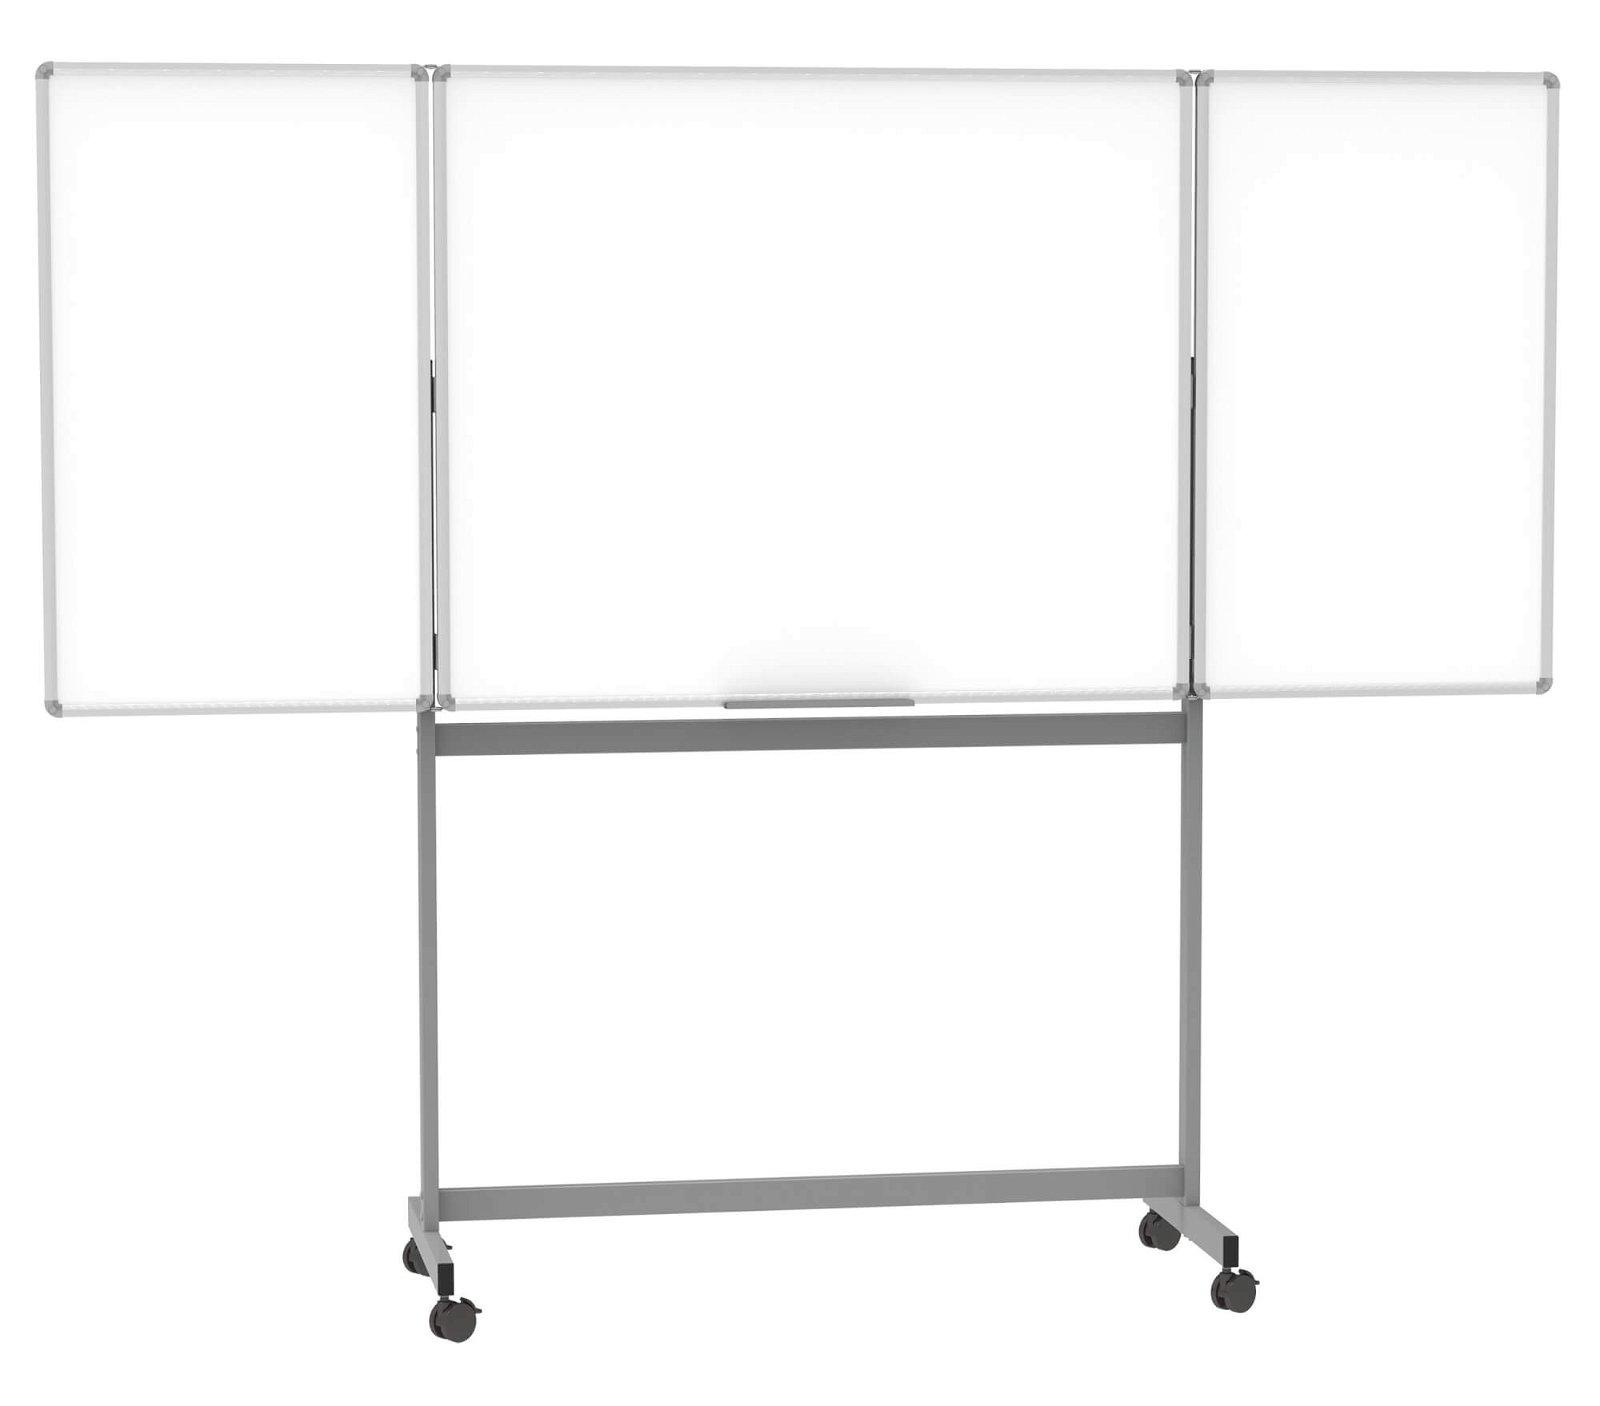 Mobile Klapptafel MAULstandard 100 x 150 cm